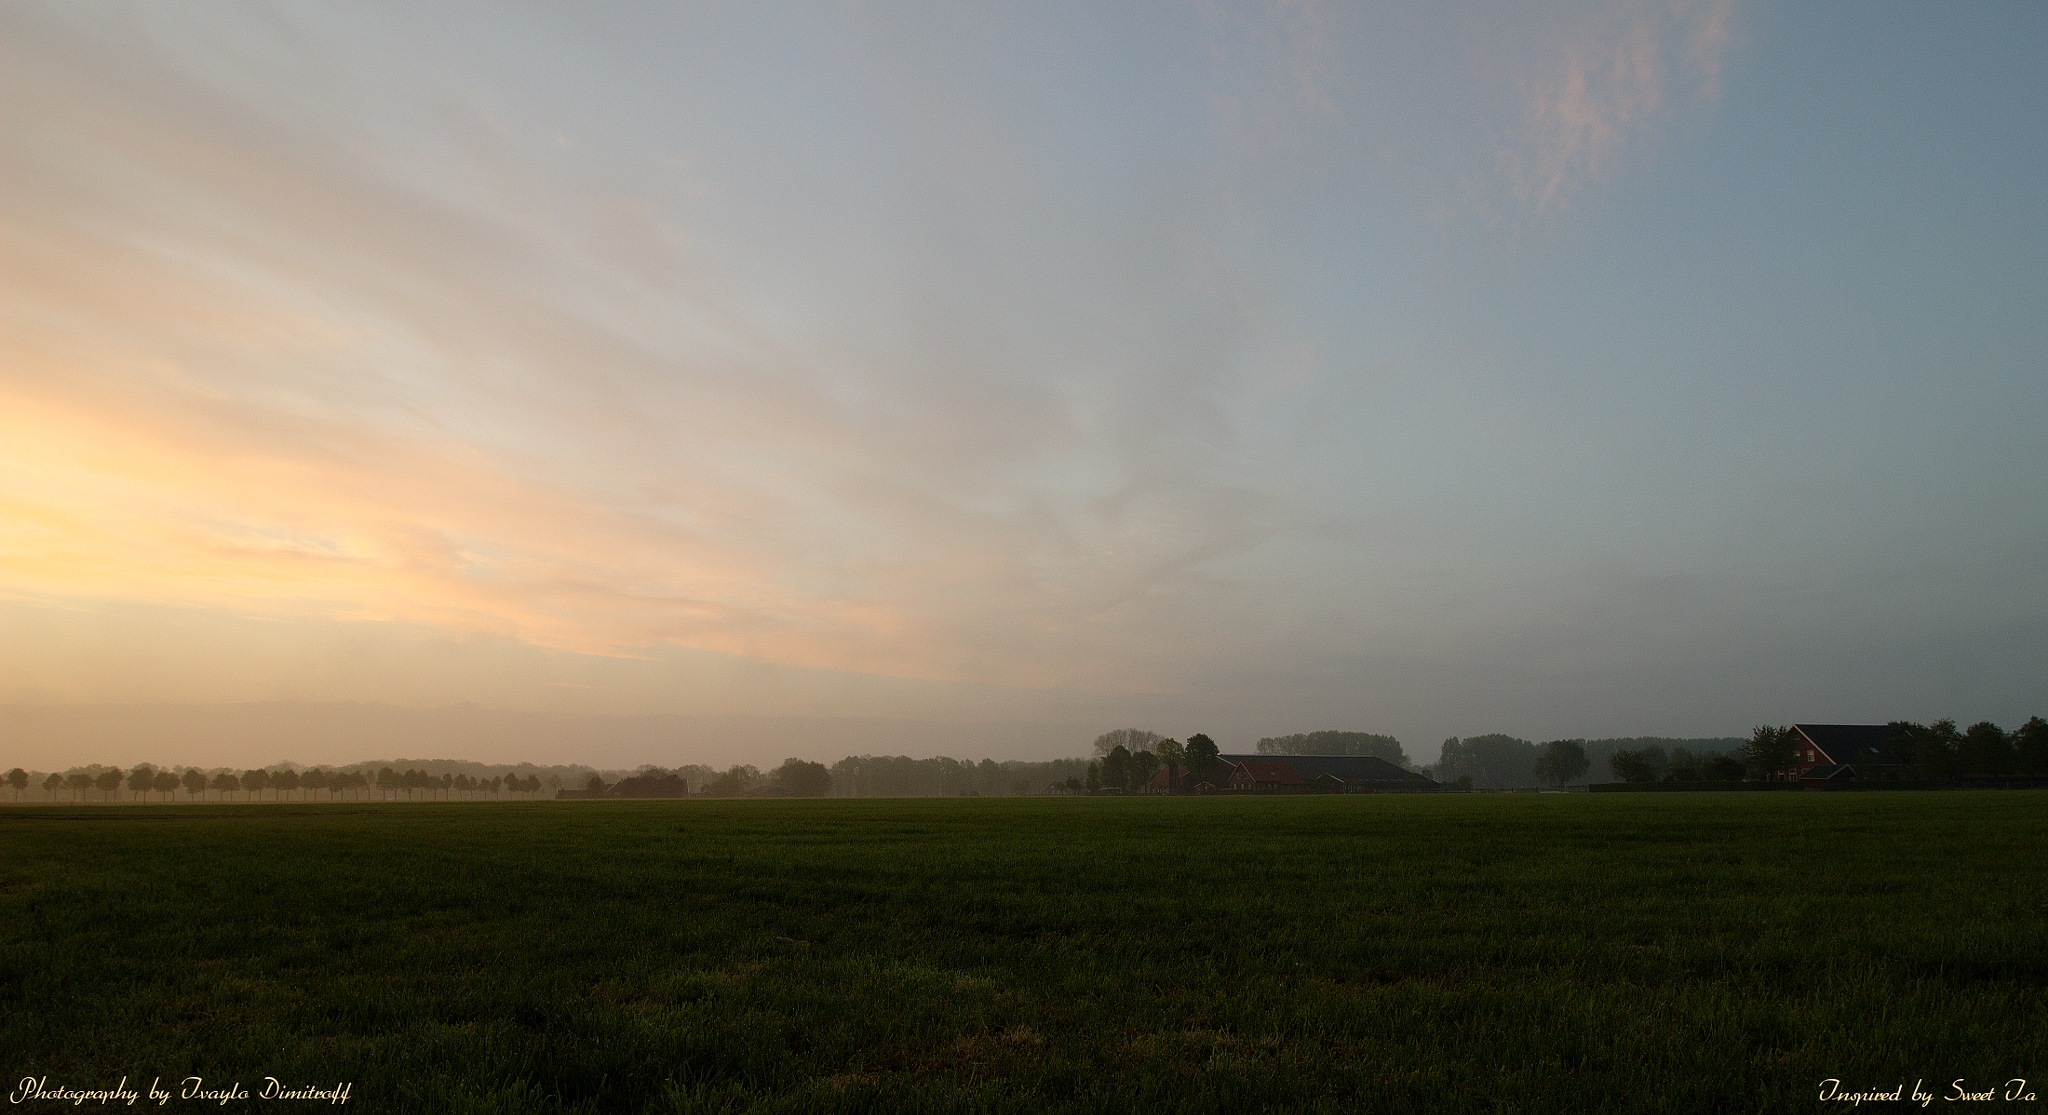 Sunrise by Dimitroff